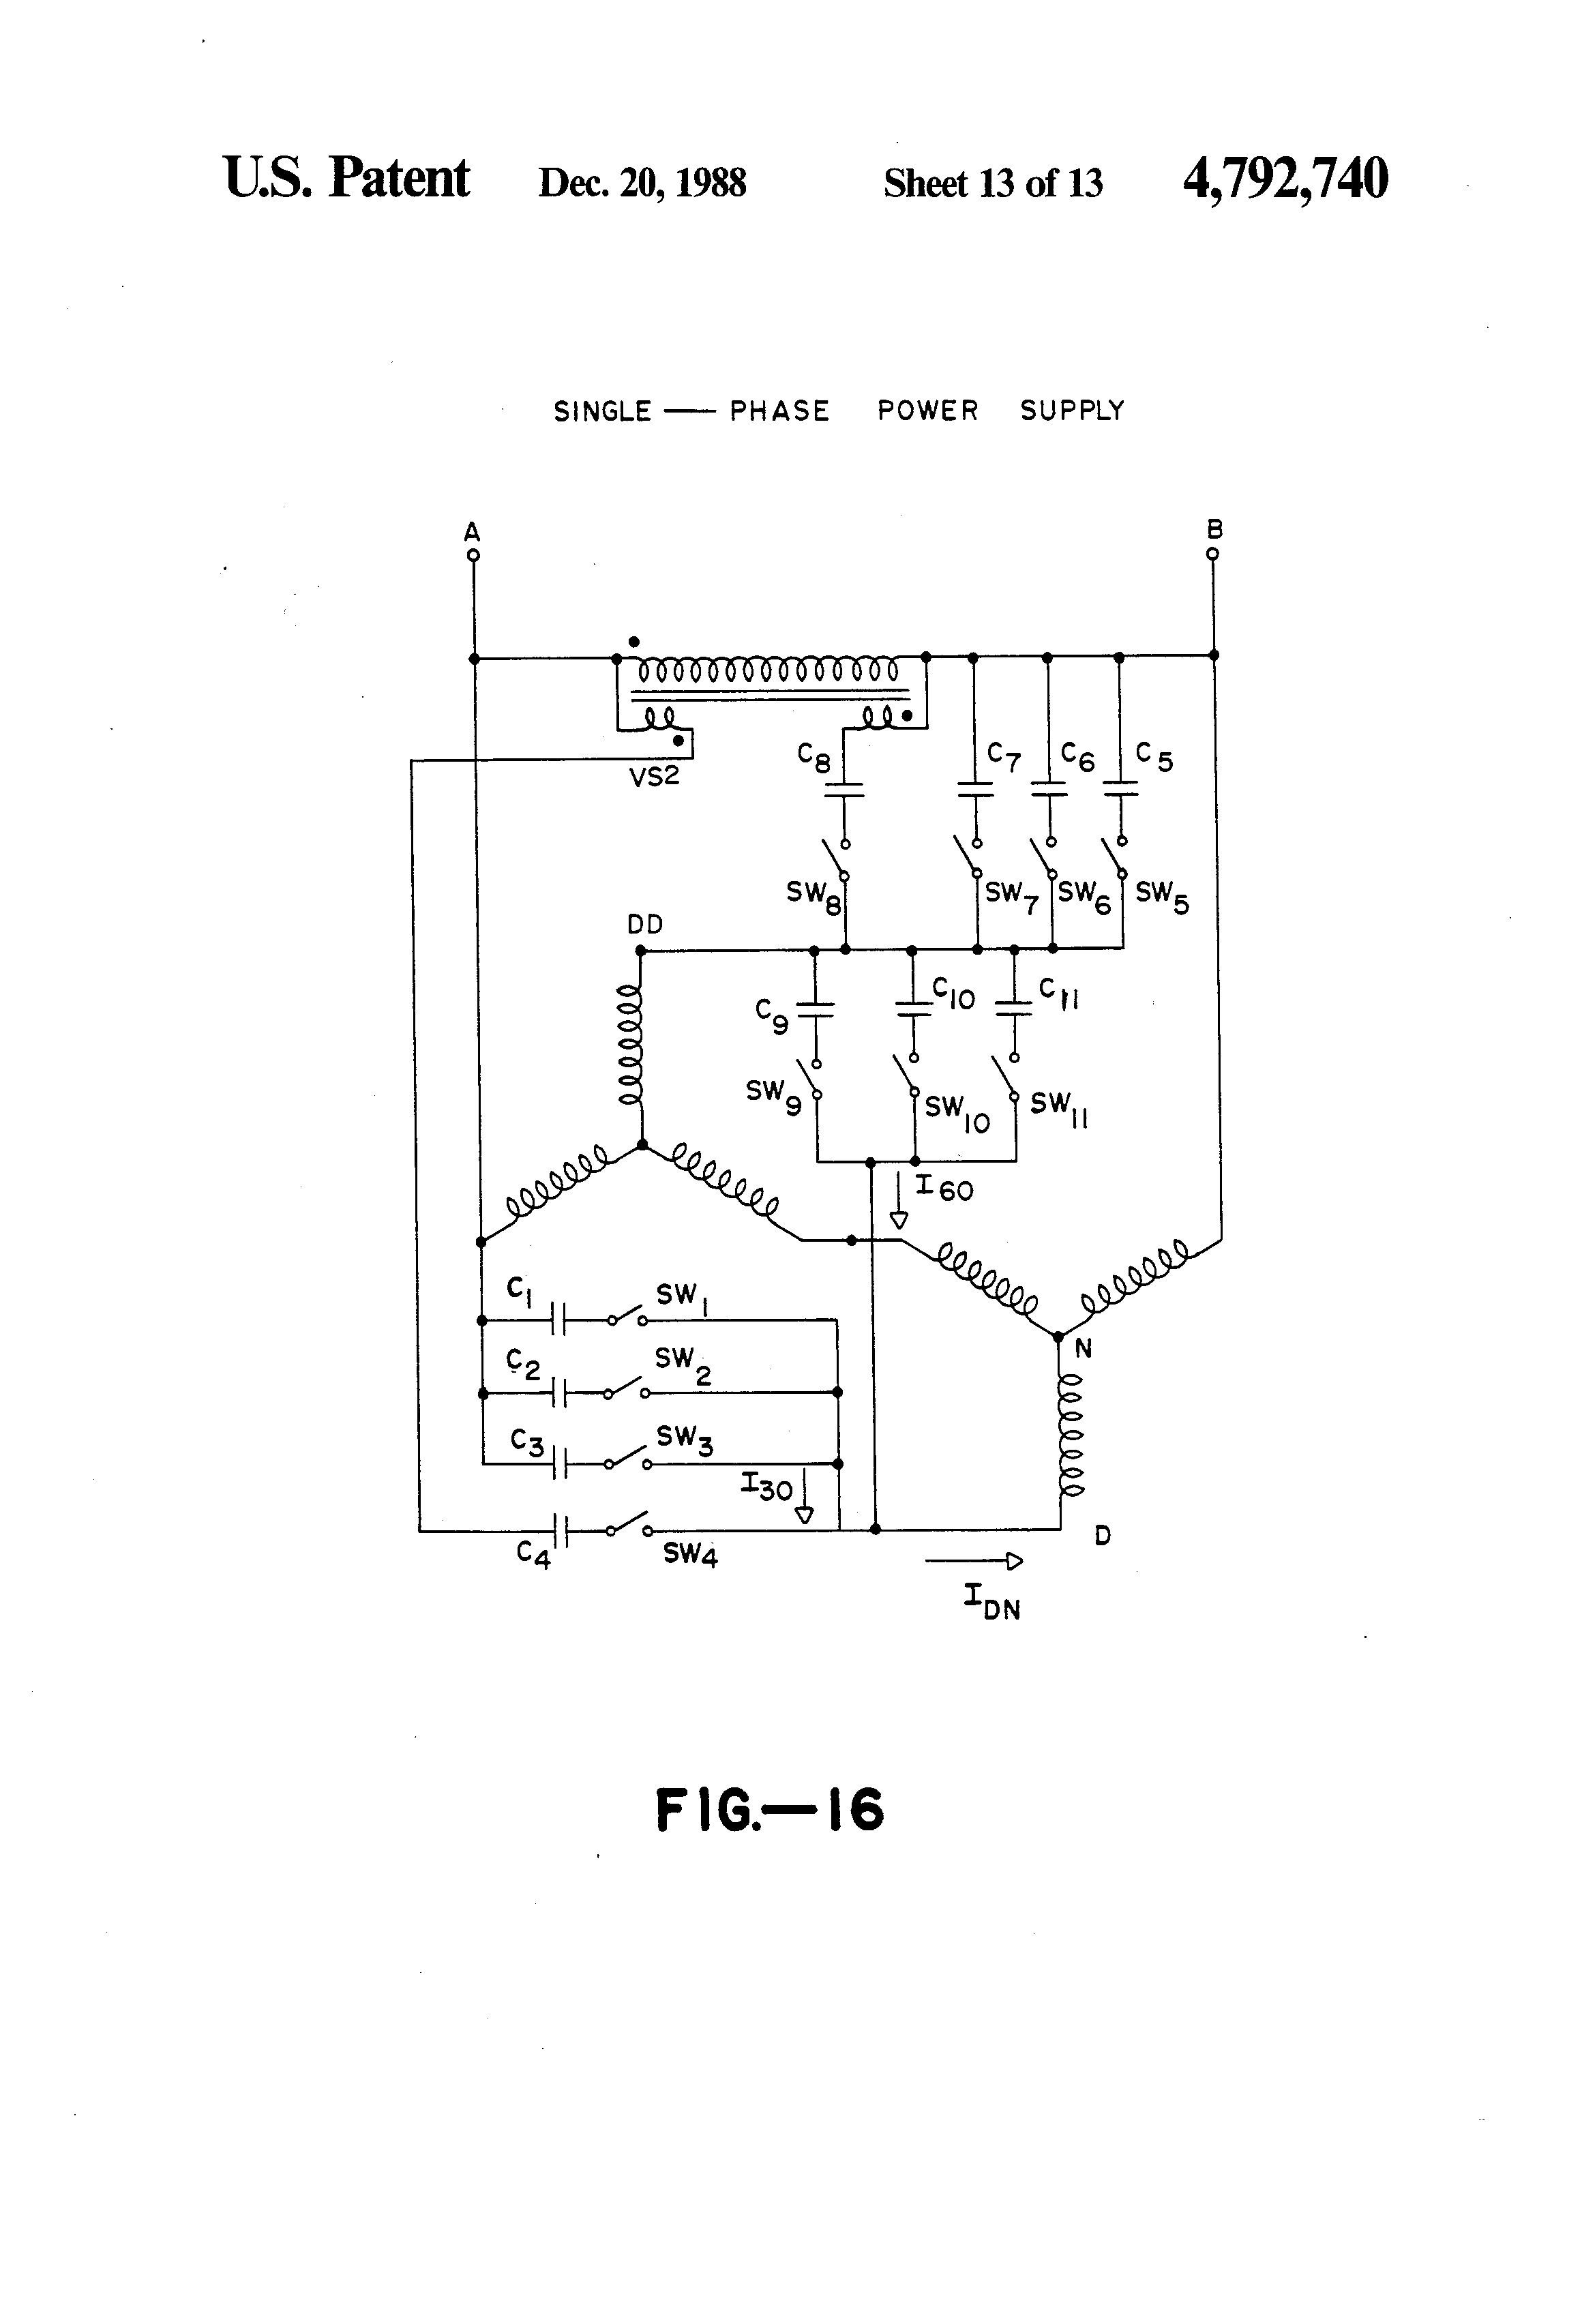 Ronk Roto Phase Wiring Diagram | Wiring Diagram - Rotary Phase Converter Wiring Diagram